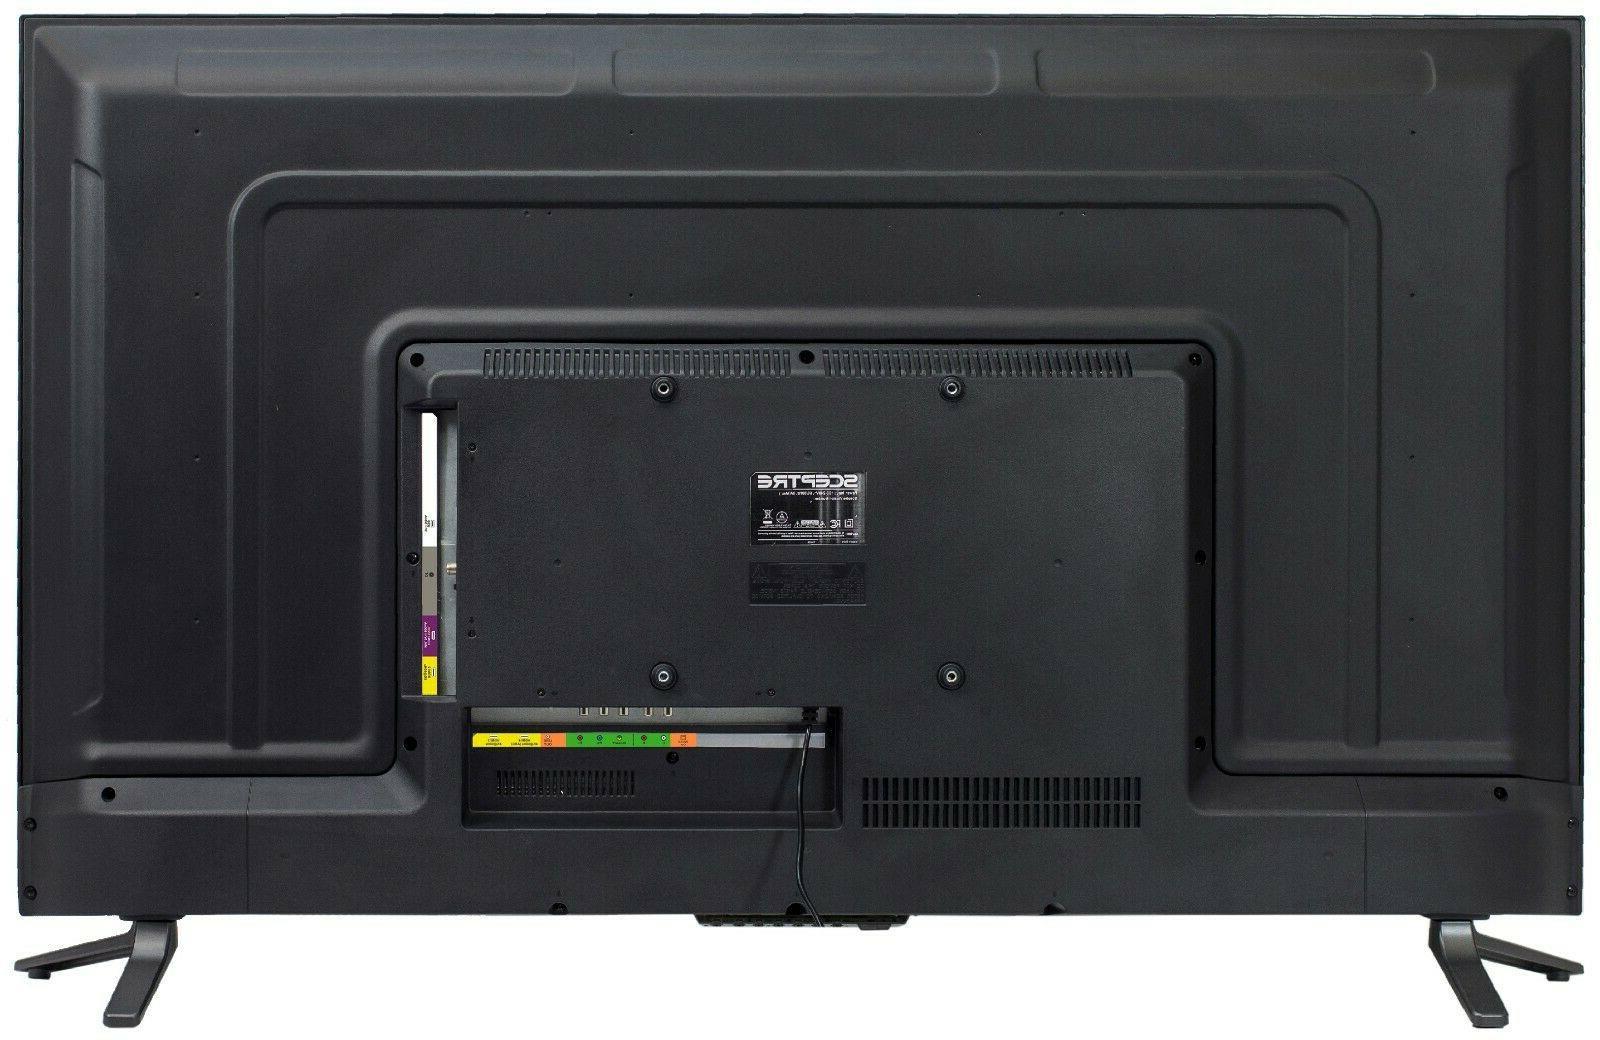 Brand New Sceptre Class 4K UHD TV HDR